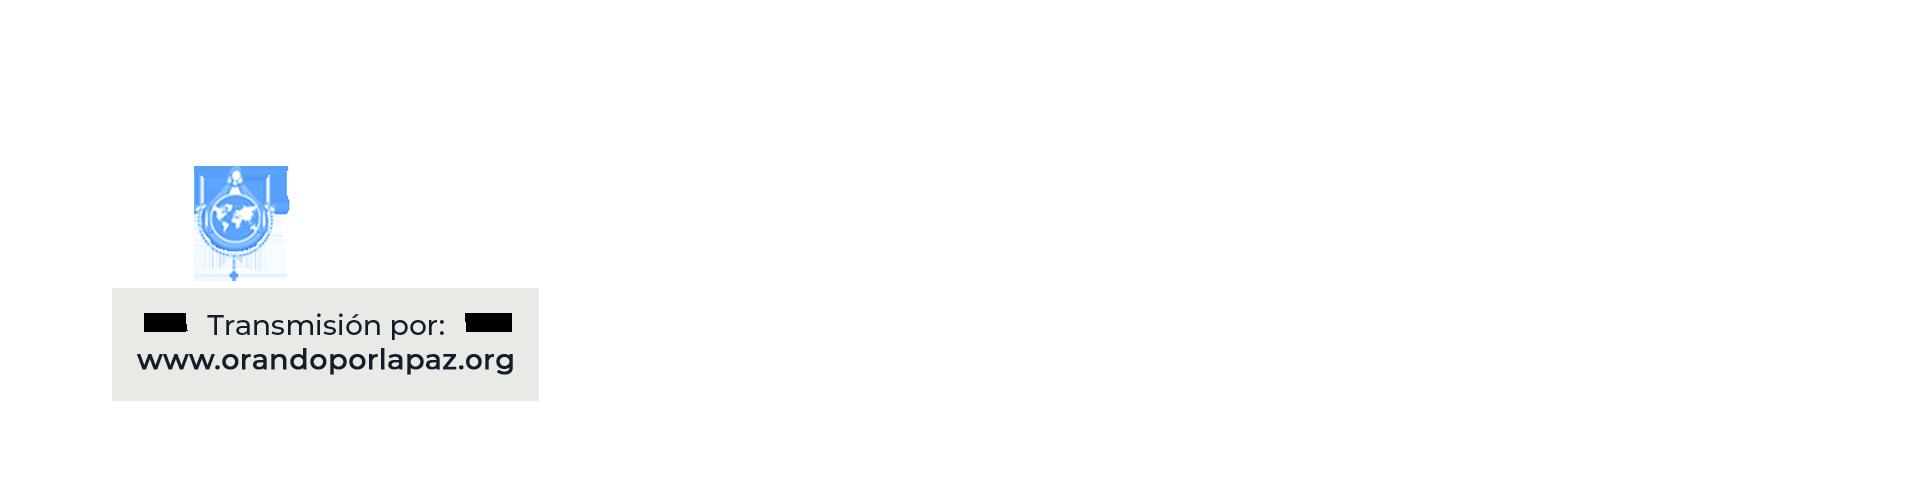 bn_logos_esp.png